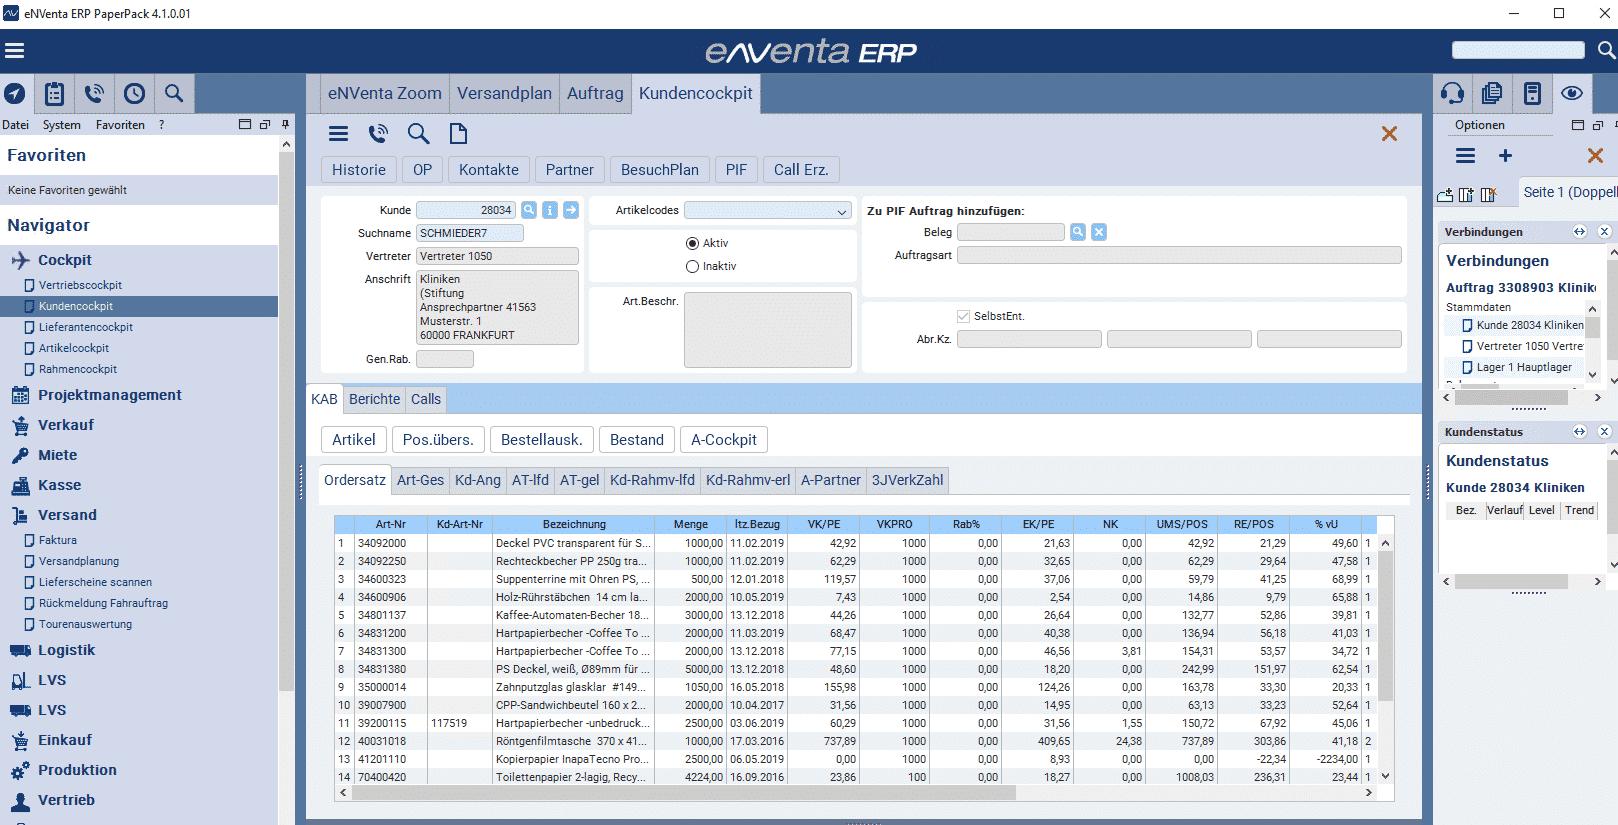 eNVenta ERP - Paperpack Kundencockpit